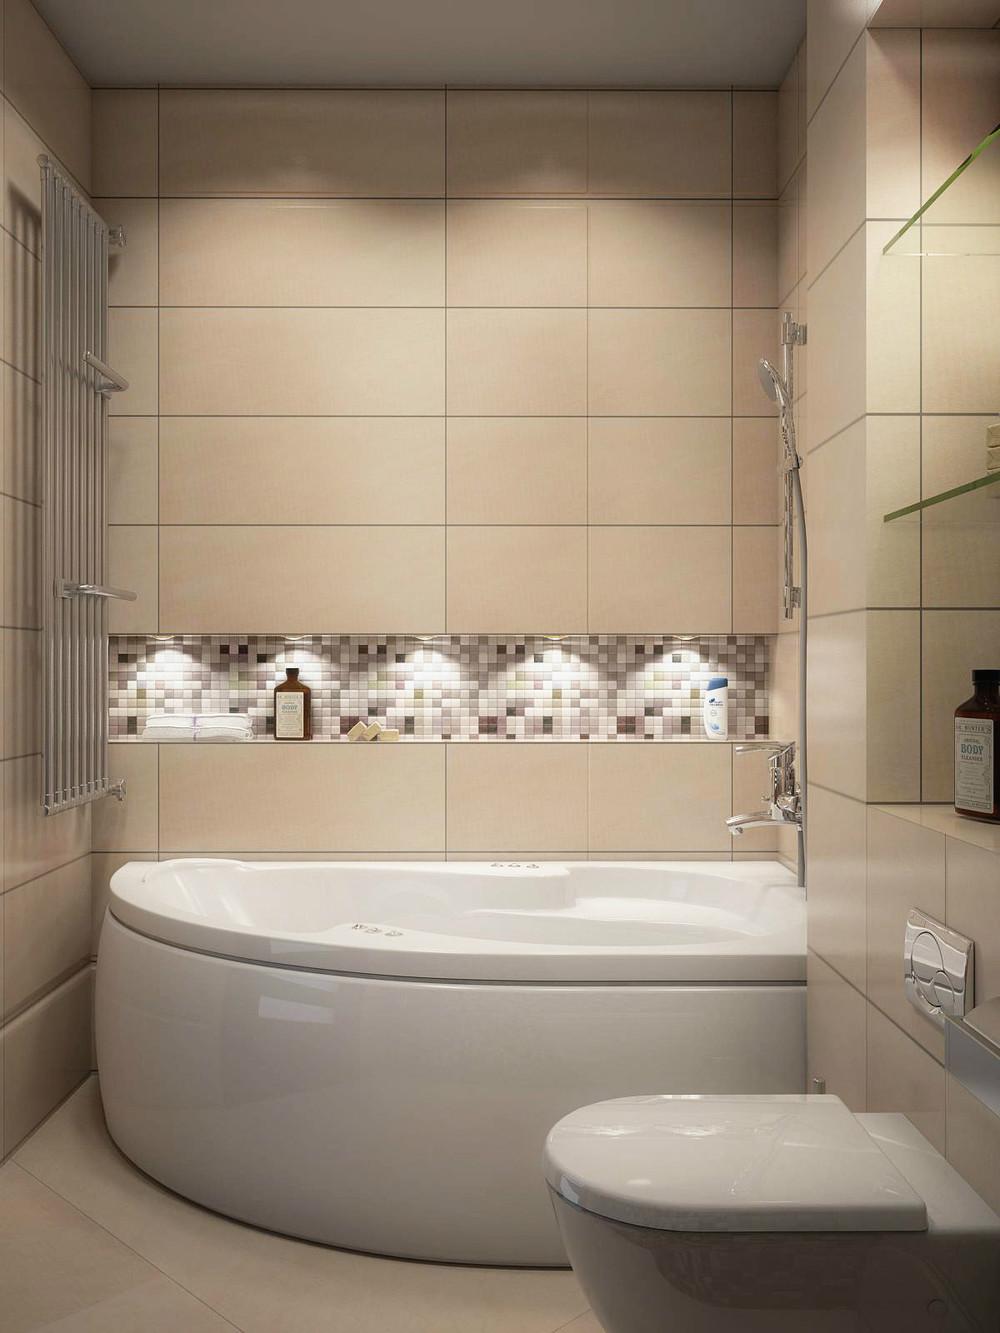 Бежевые ванные комнаты фото - дизайн